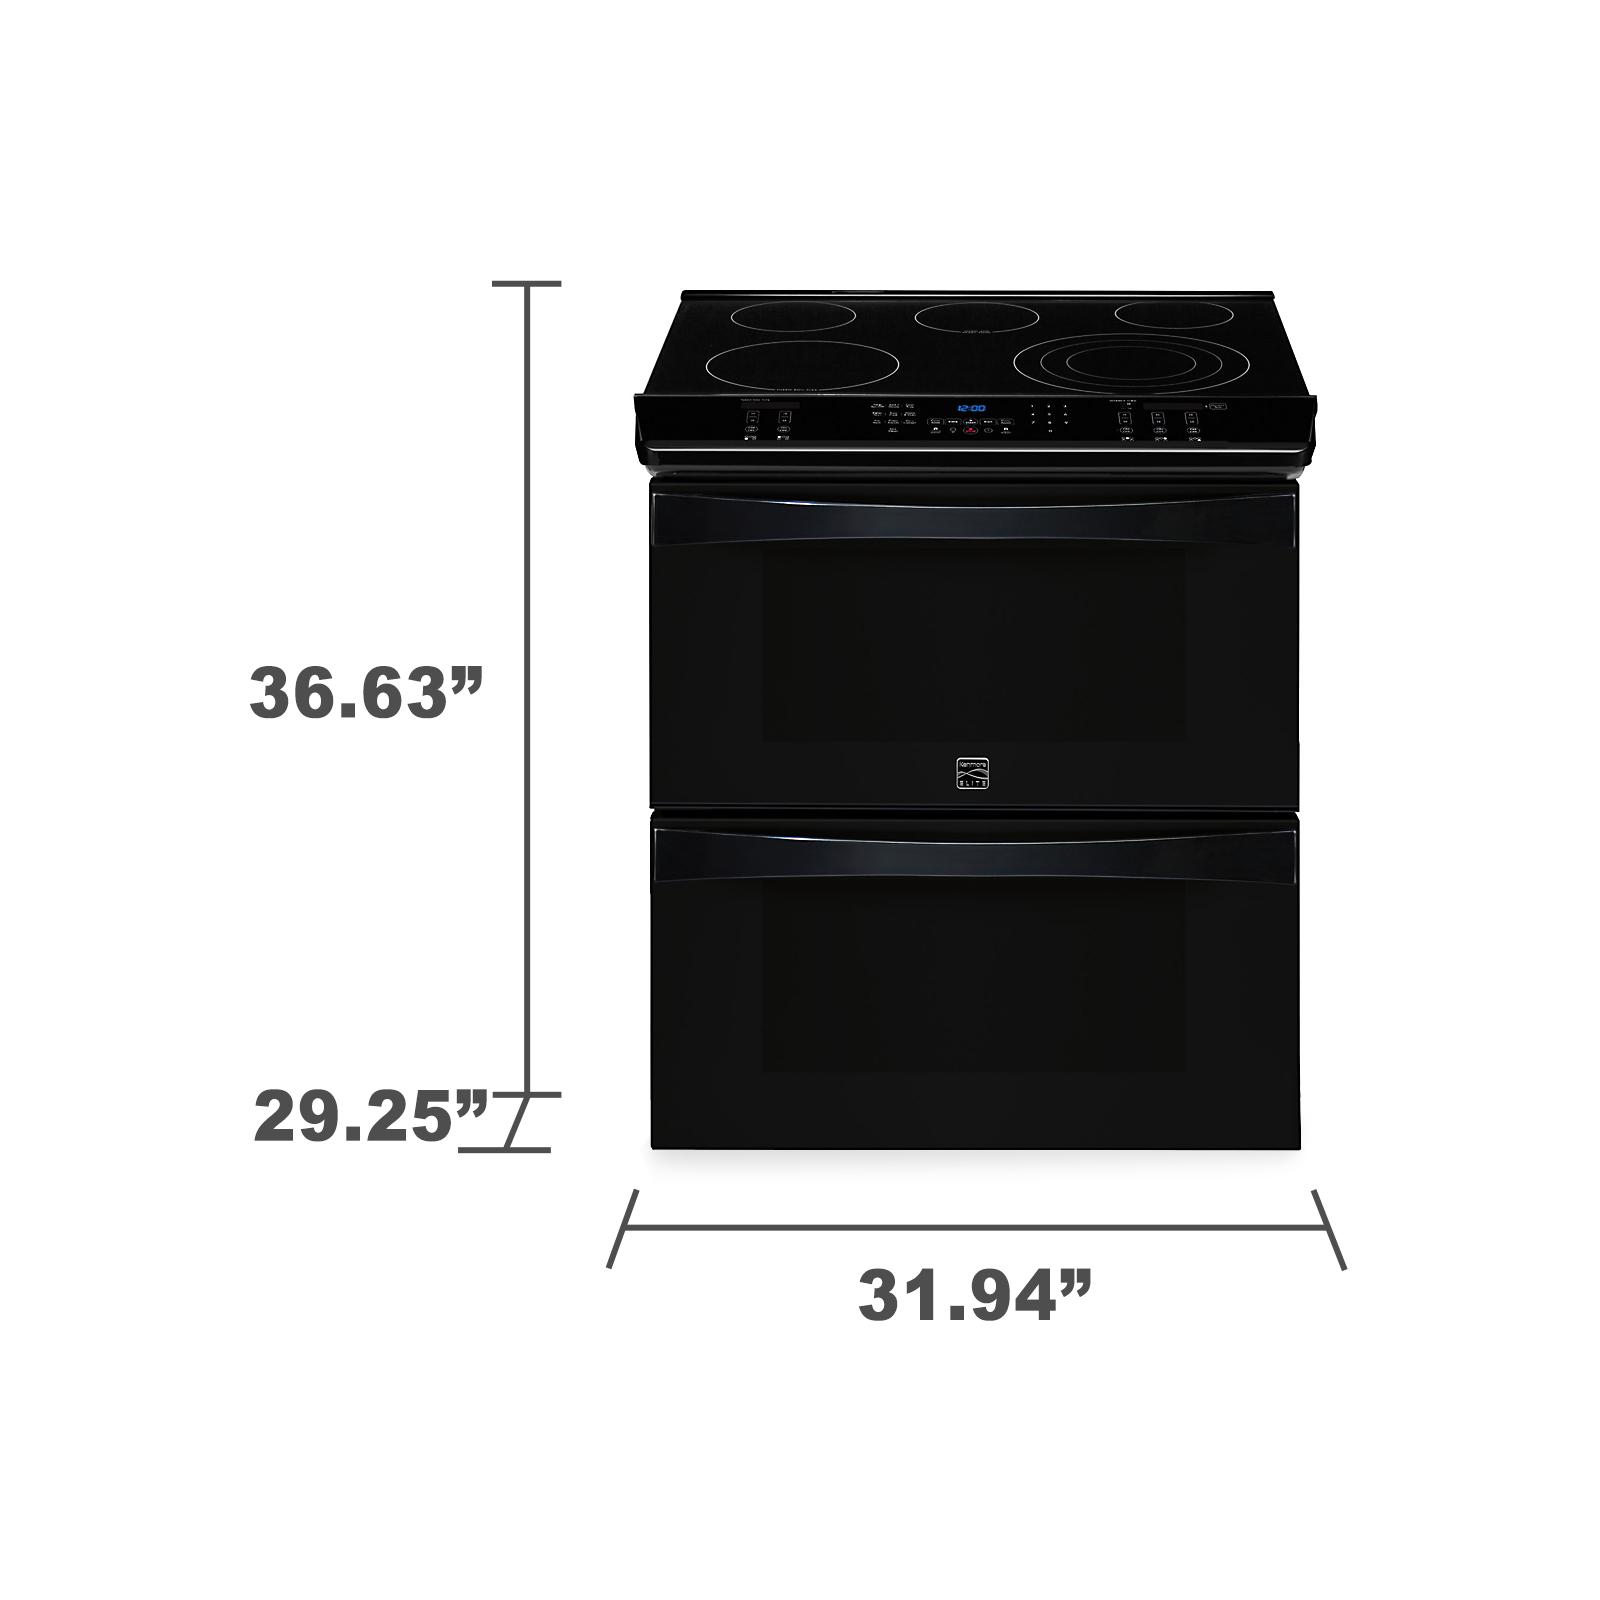 "Kenmore Elite 30"" Double-Oven Slide-In Electric Range w/ Convection  - Black"